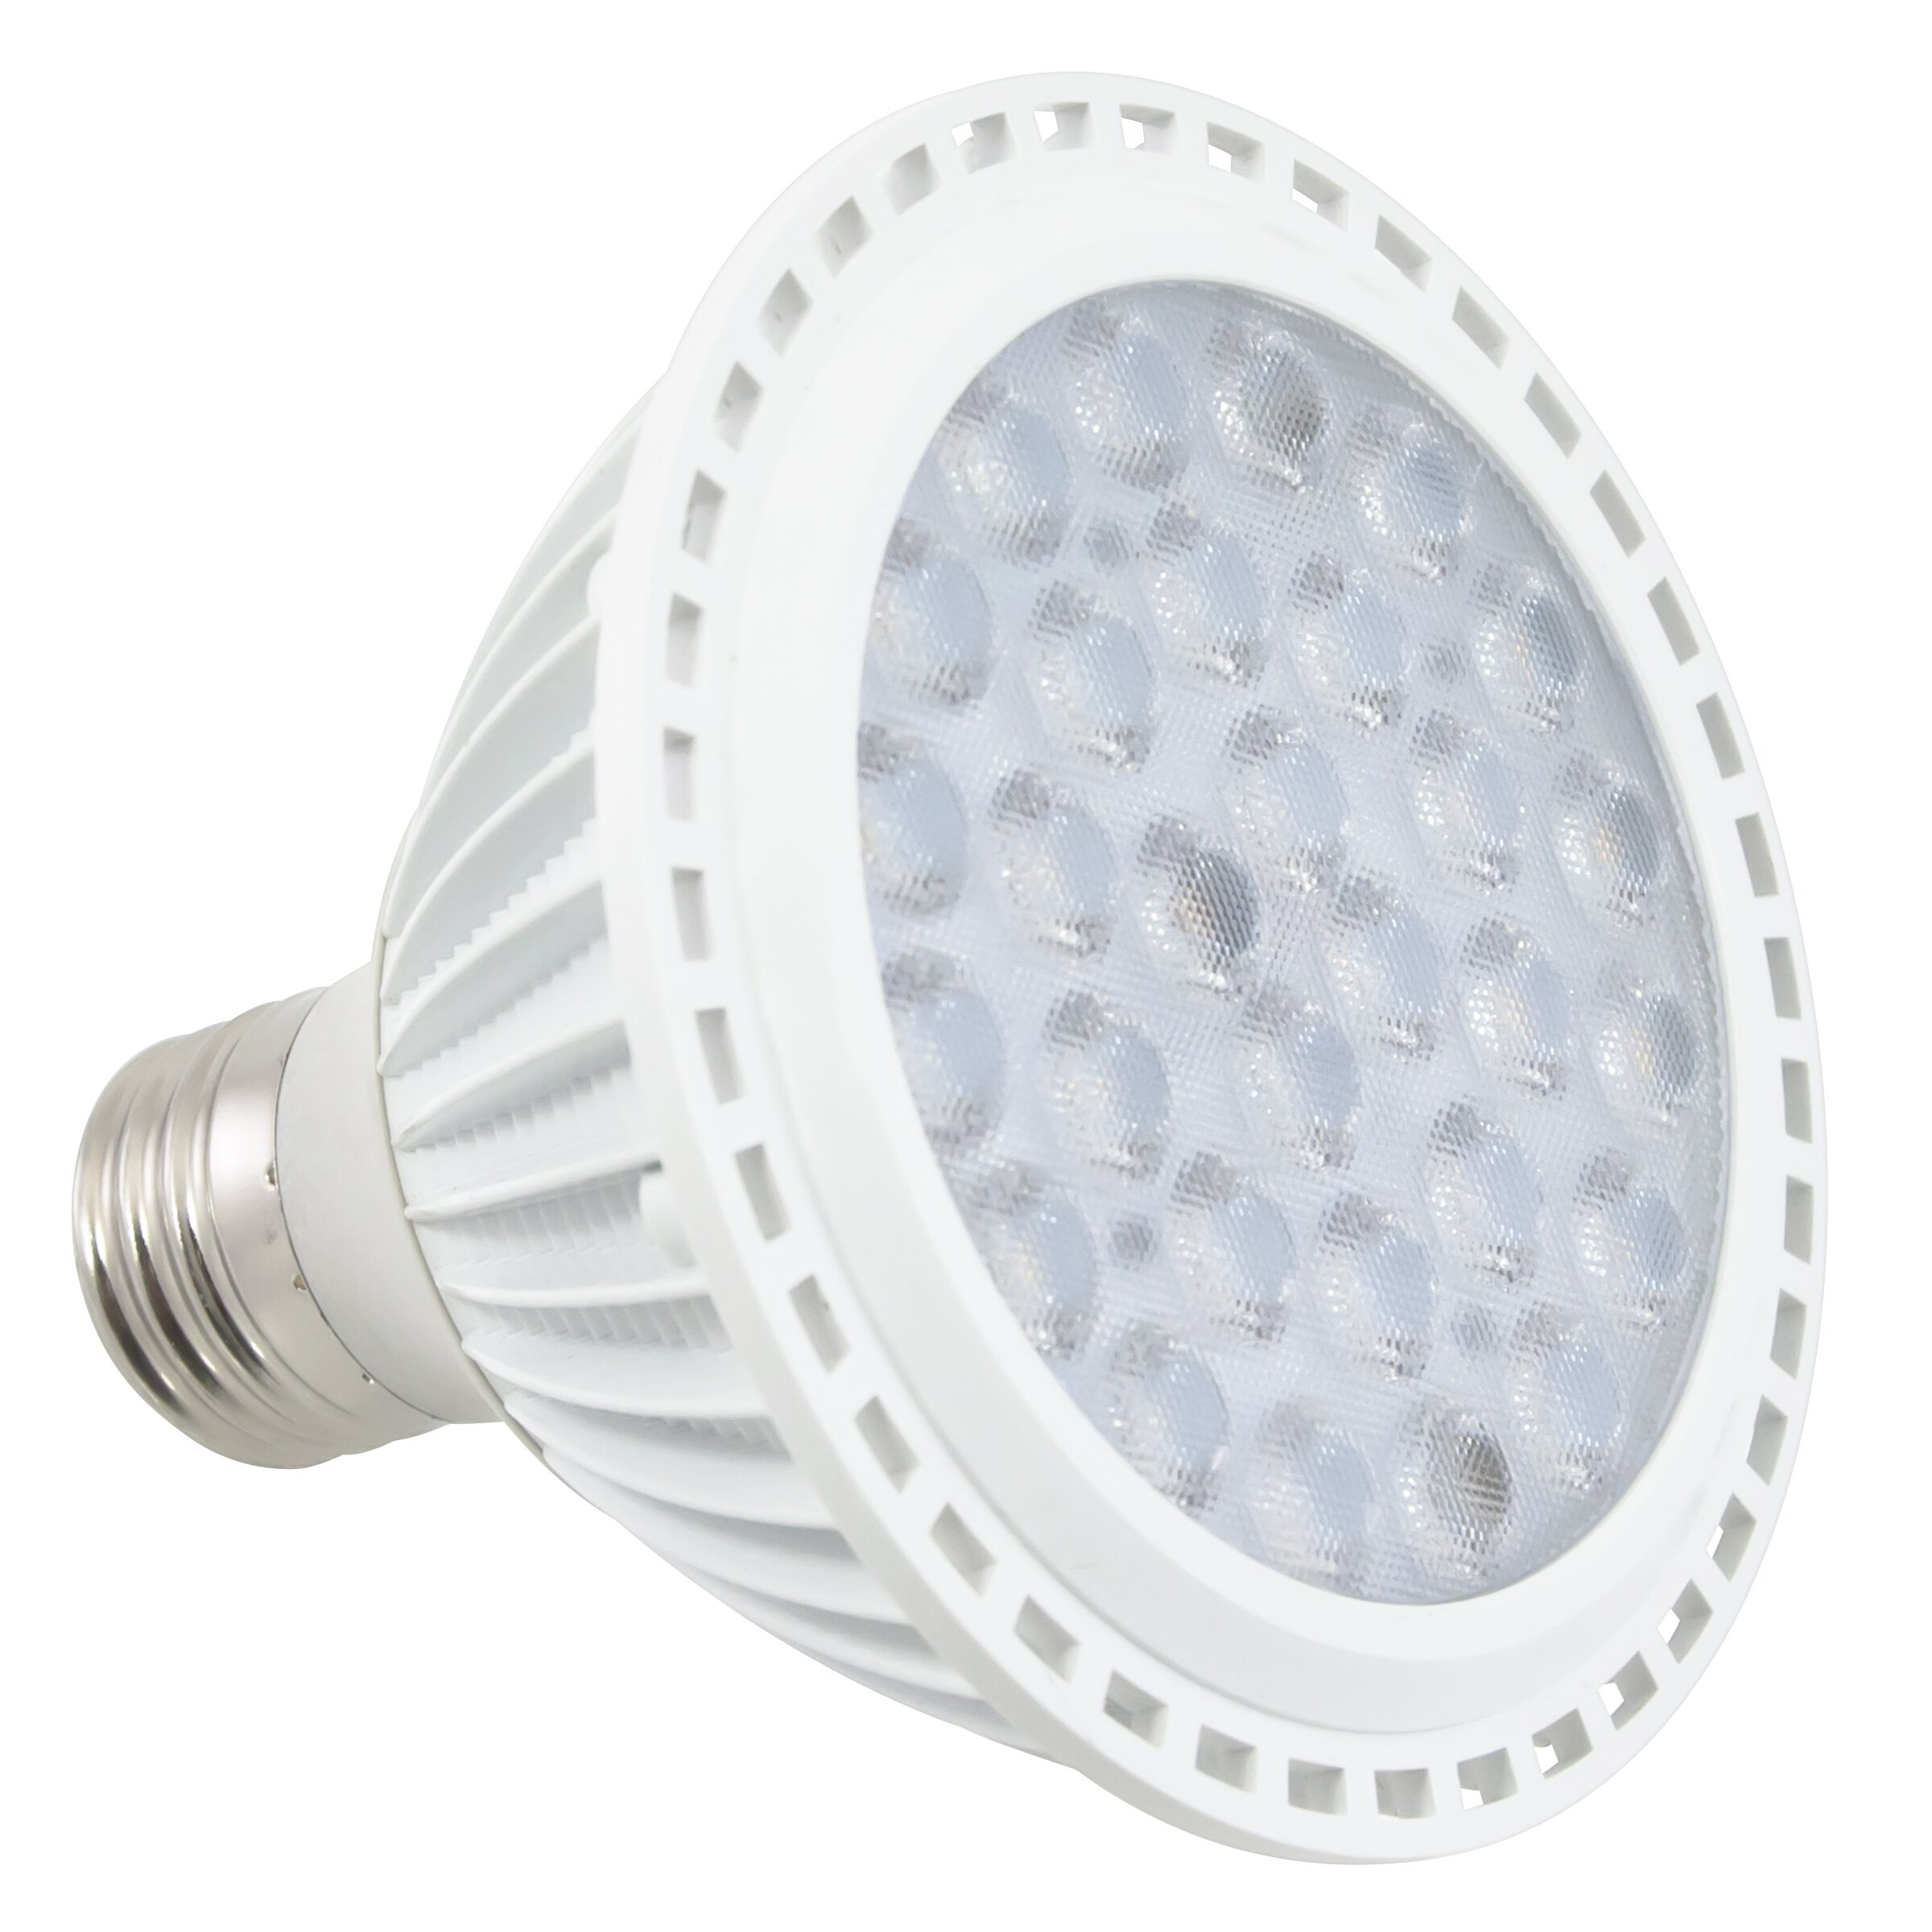 American Lighting LLC LED Light Bulb